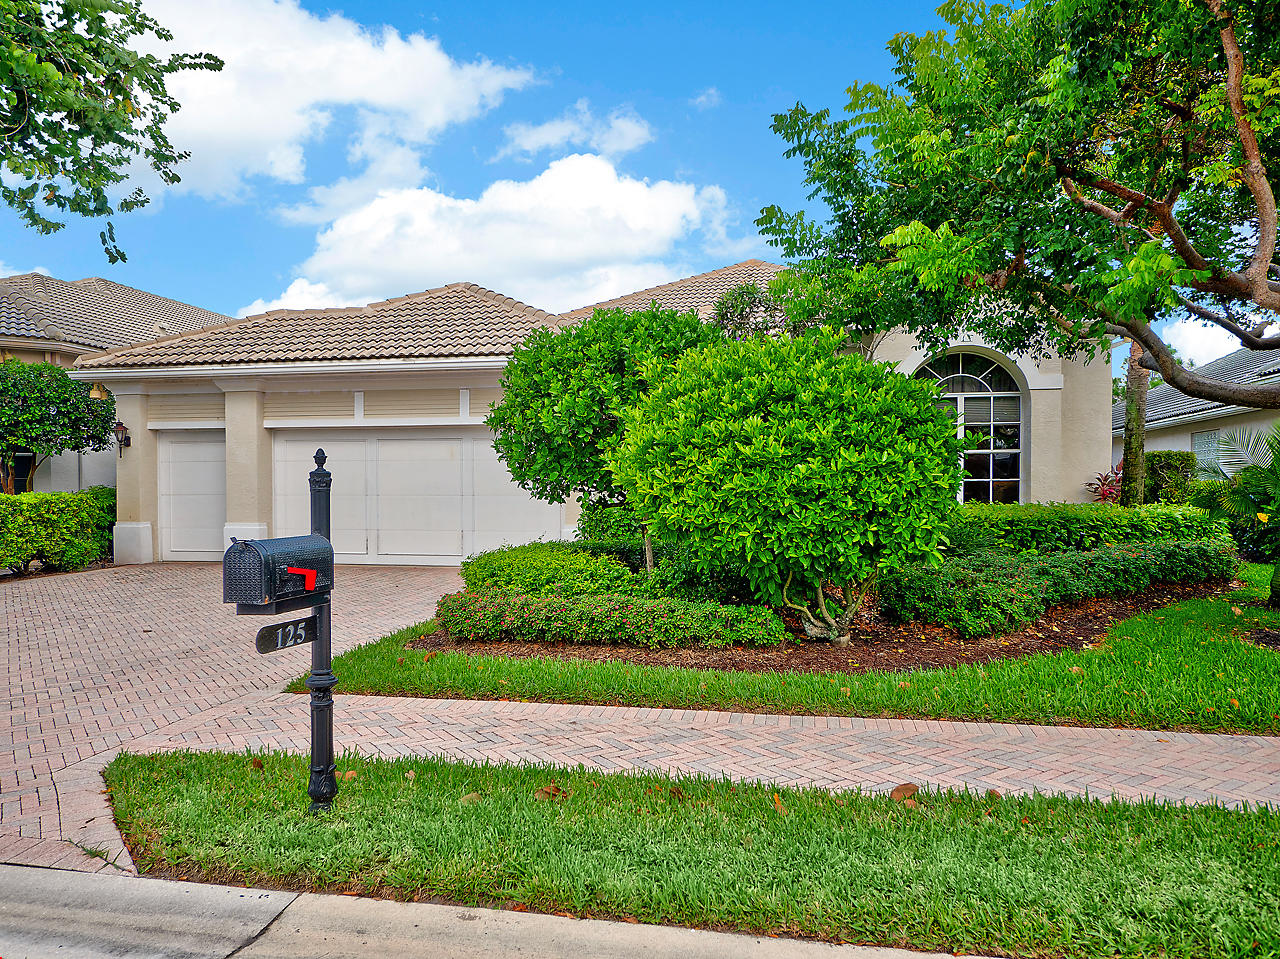 125 Banyan Isle Drive Palm Beach Gardens,Florida 33418,3 Bedrooms Bedrooms,3.1 BathroomsBathrooms,A,Banyan Isle,RX-10470314